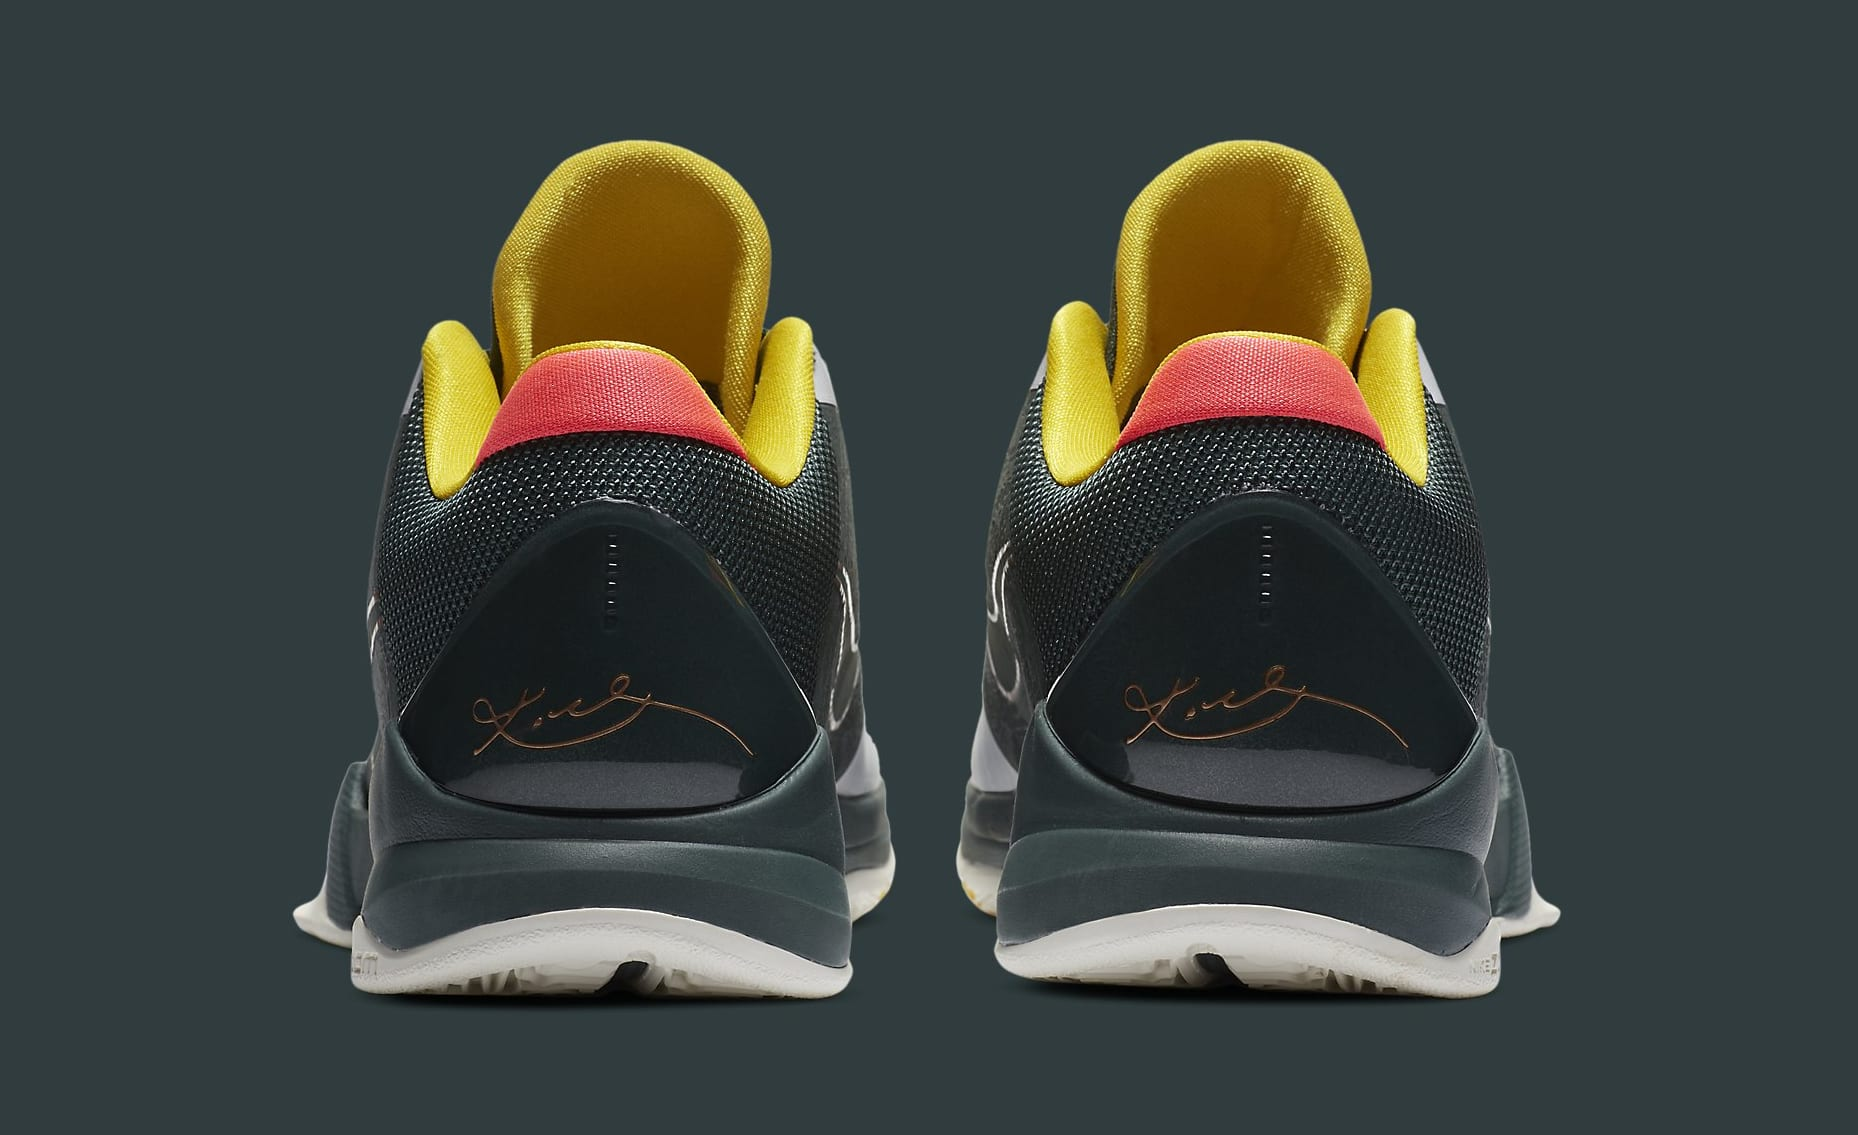 Nike Kobe 5 Protro 'EYBL' CD4991-300 Heel